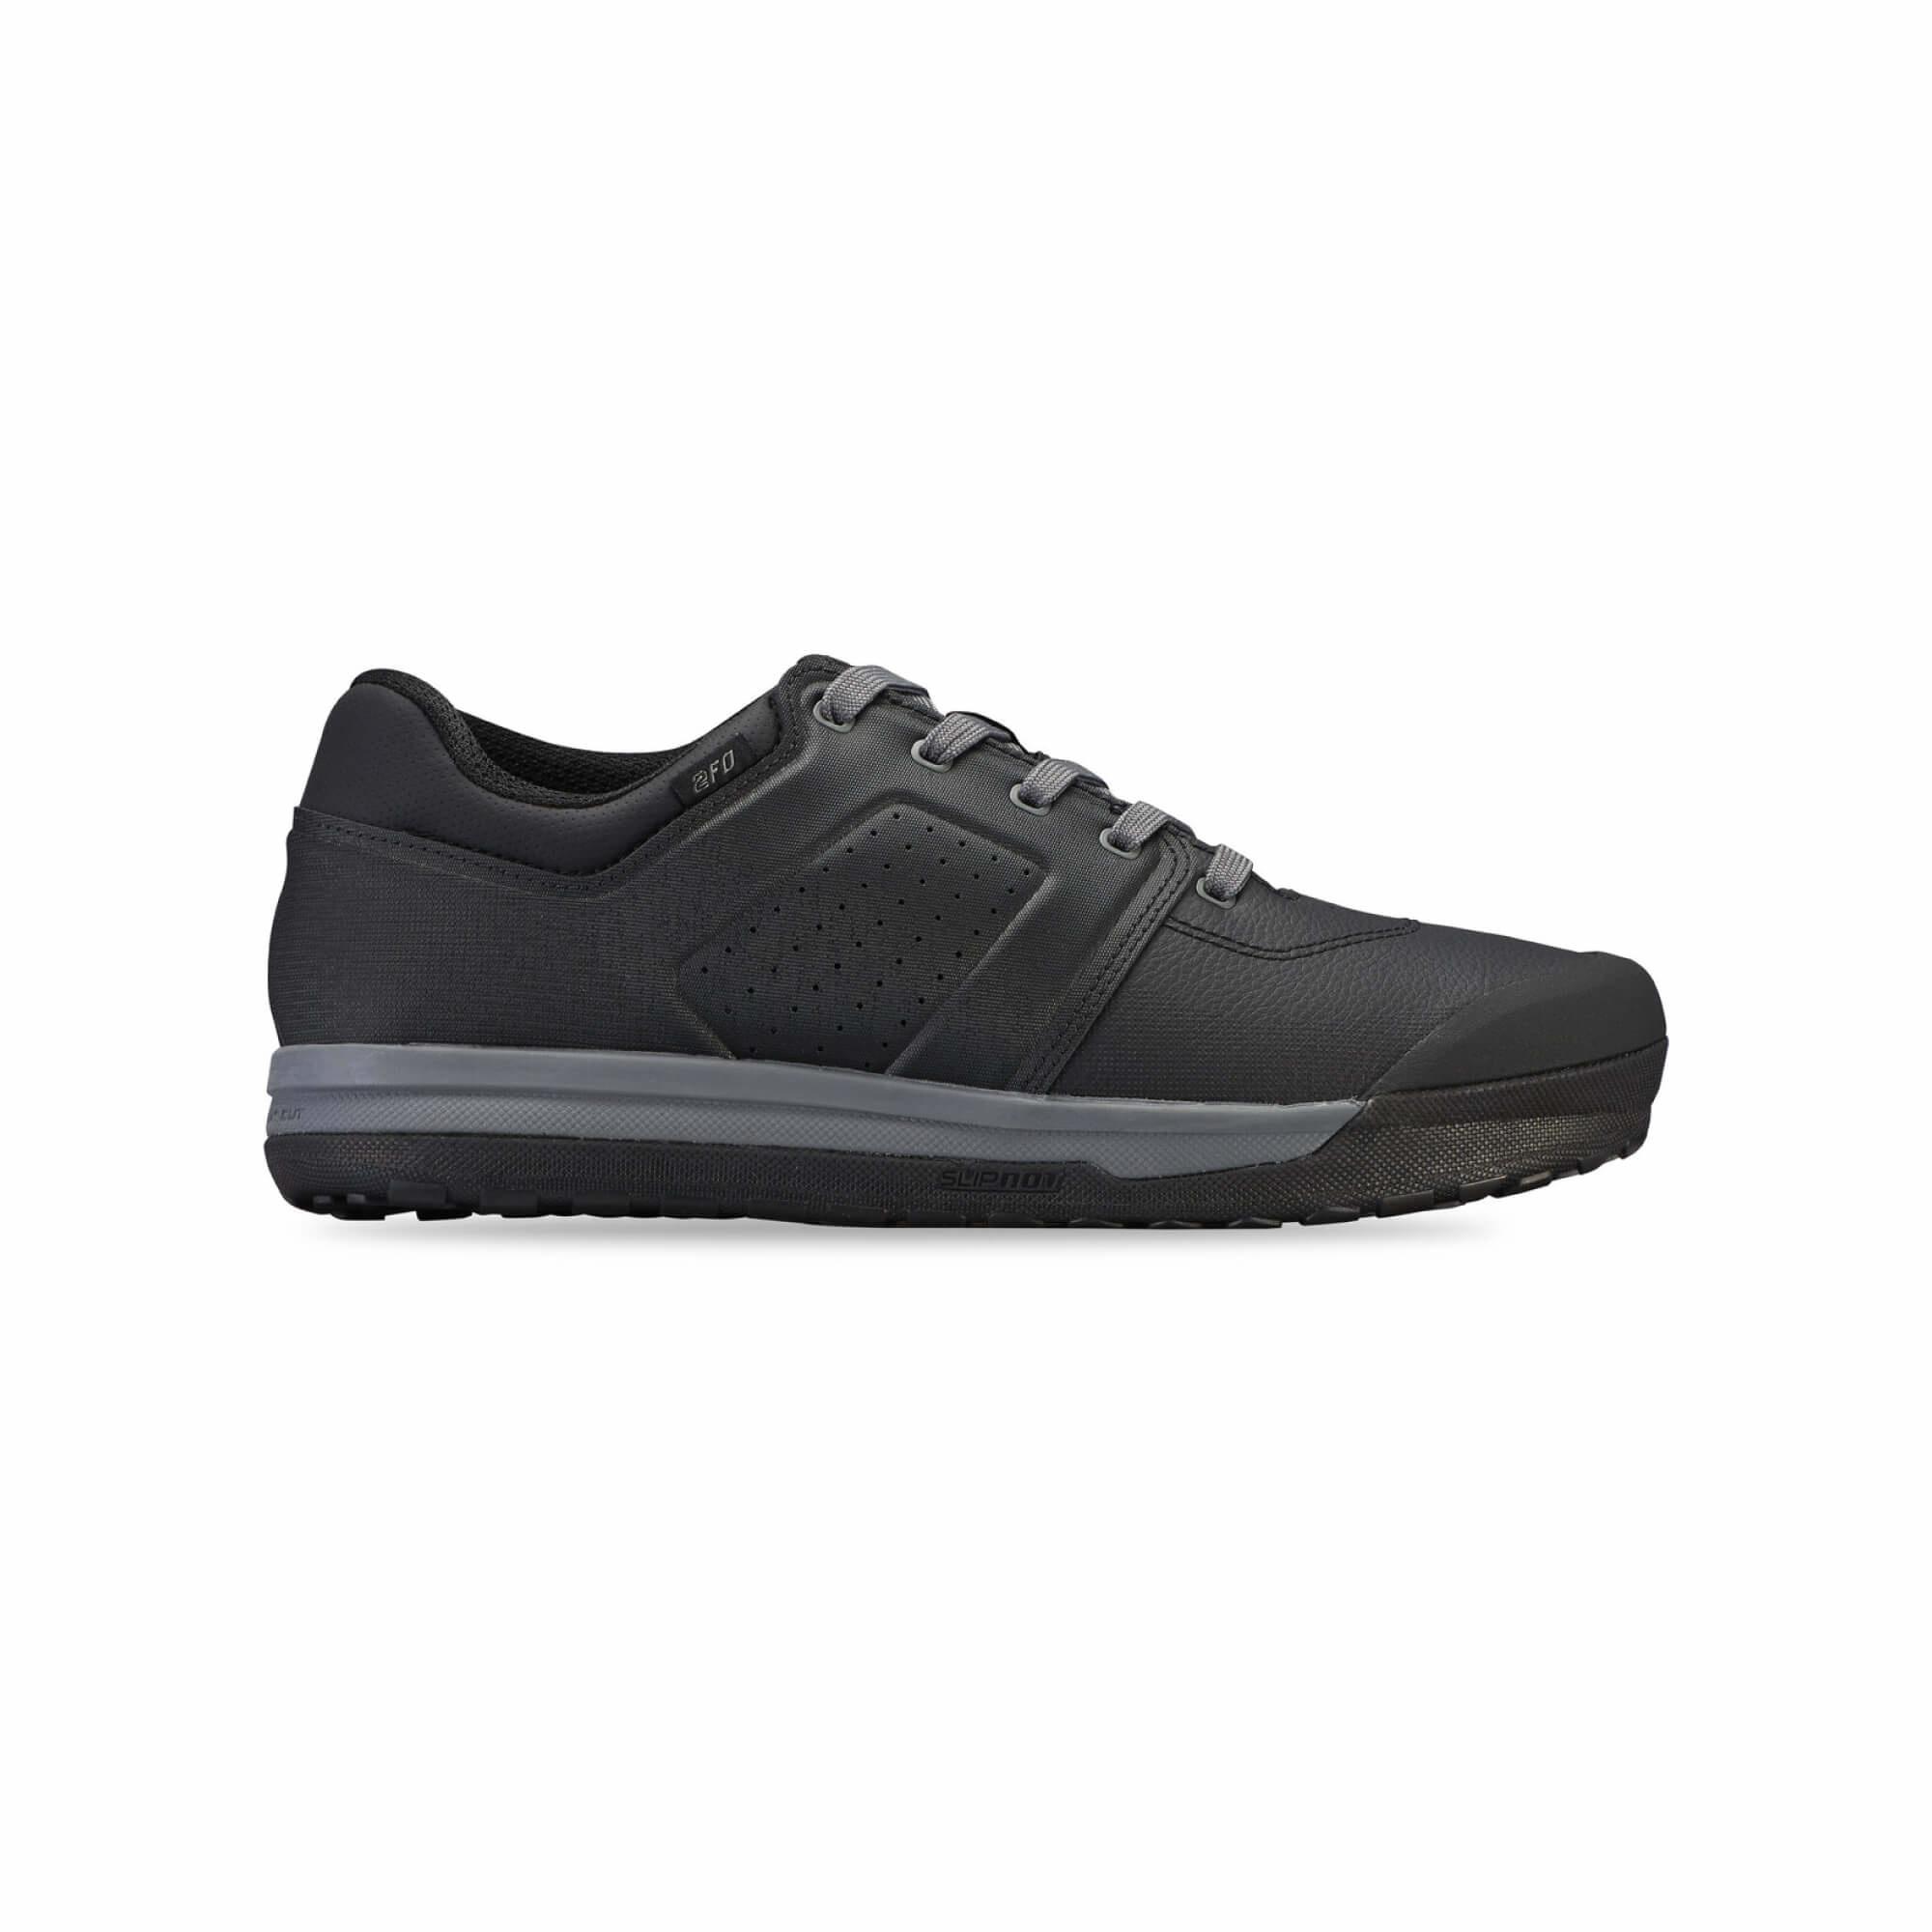 2FO DH Flat MTB Shoes 2021-1